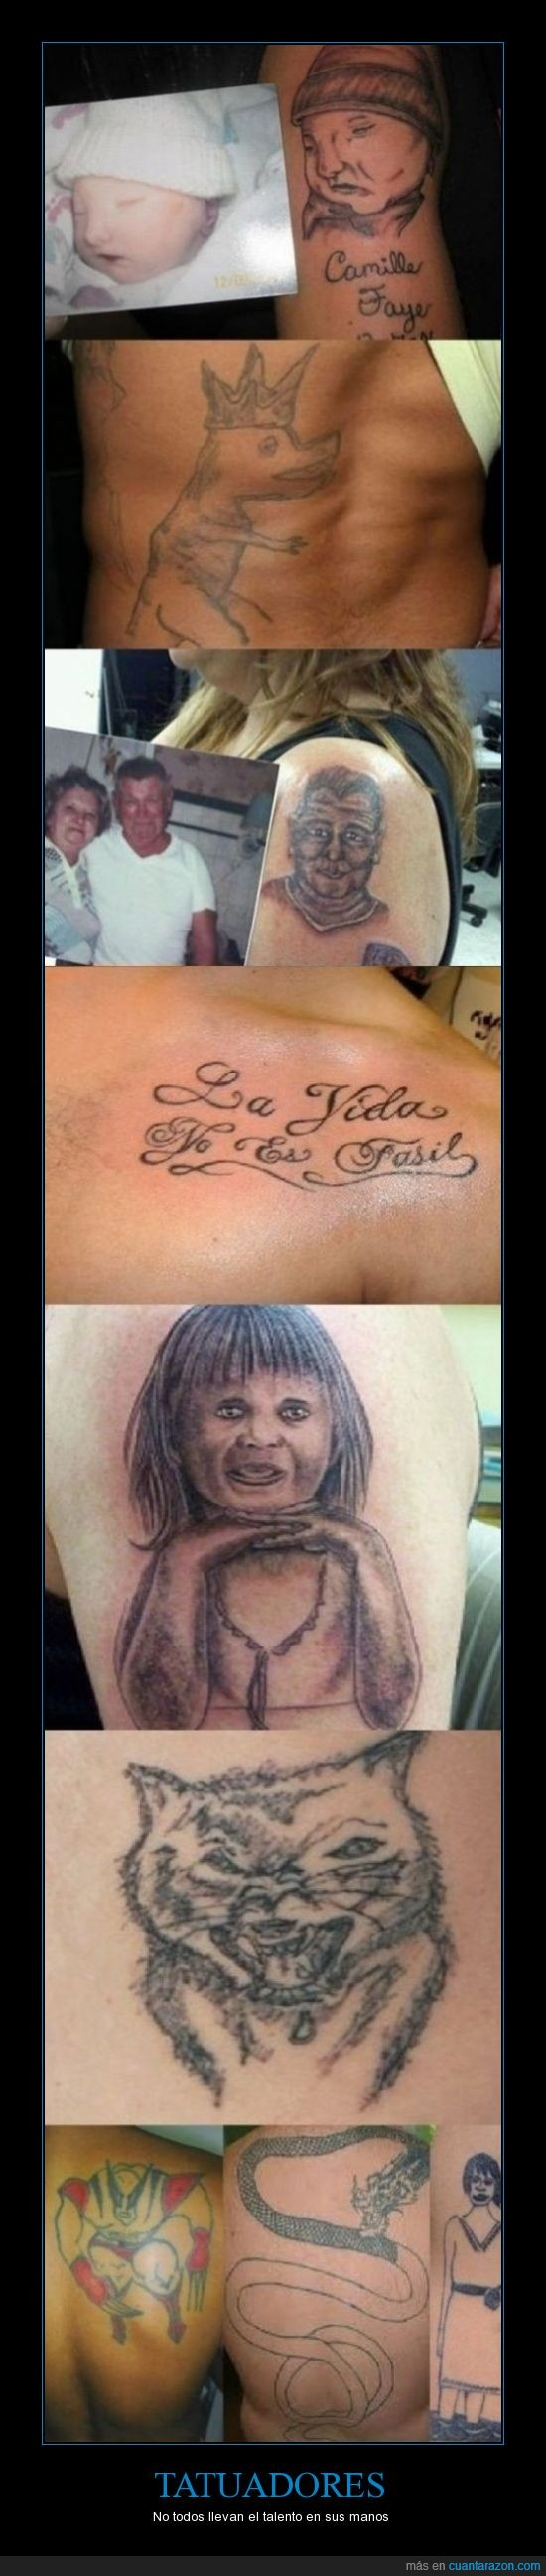 llevar,manos,talento,tatuadores,Tatuaje